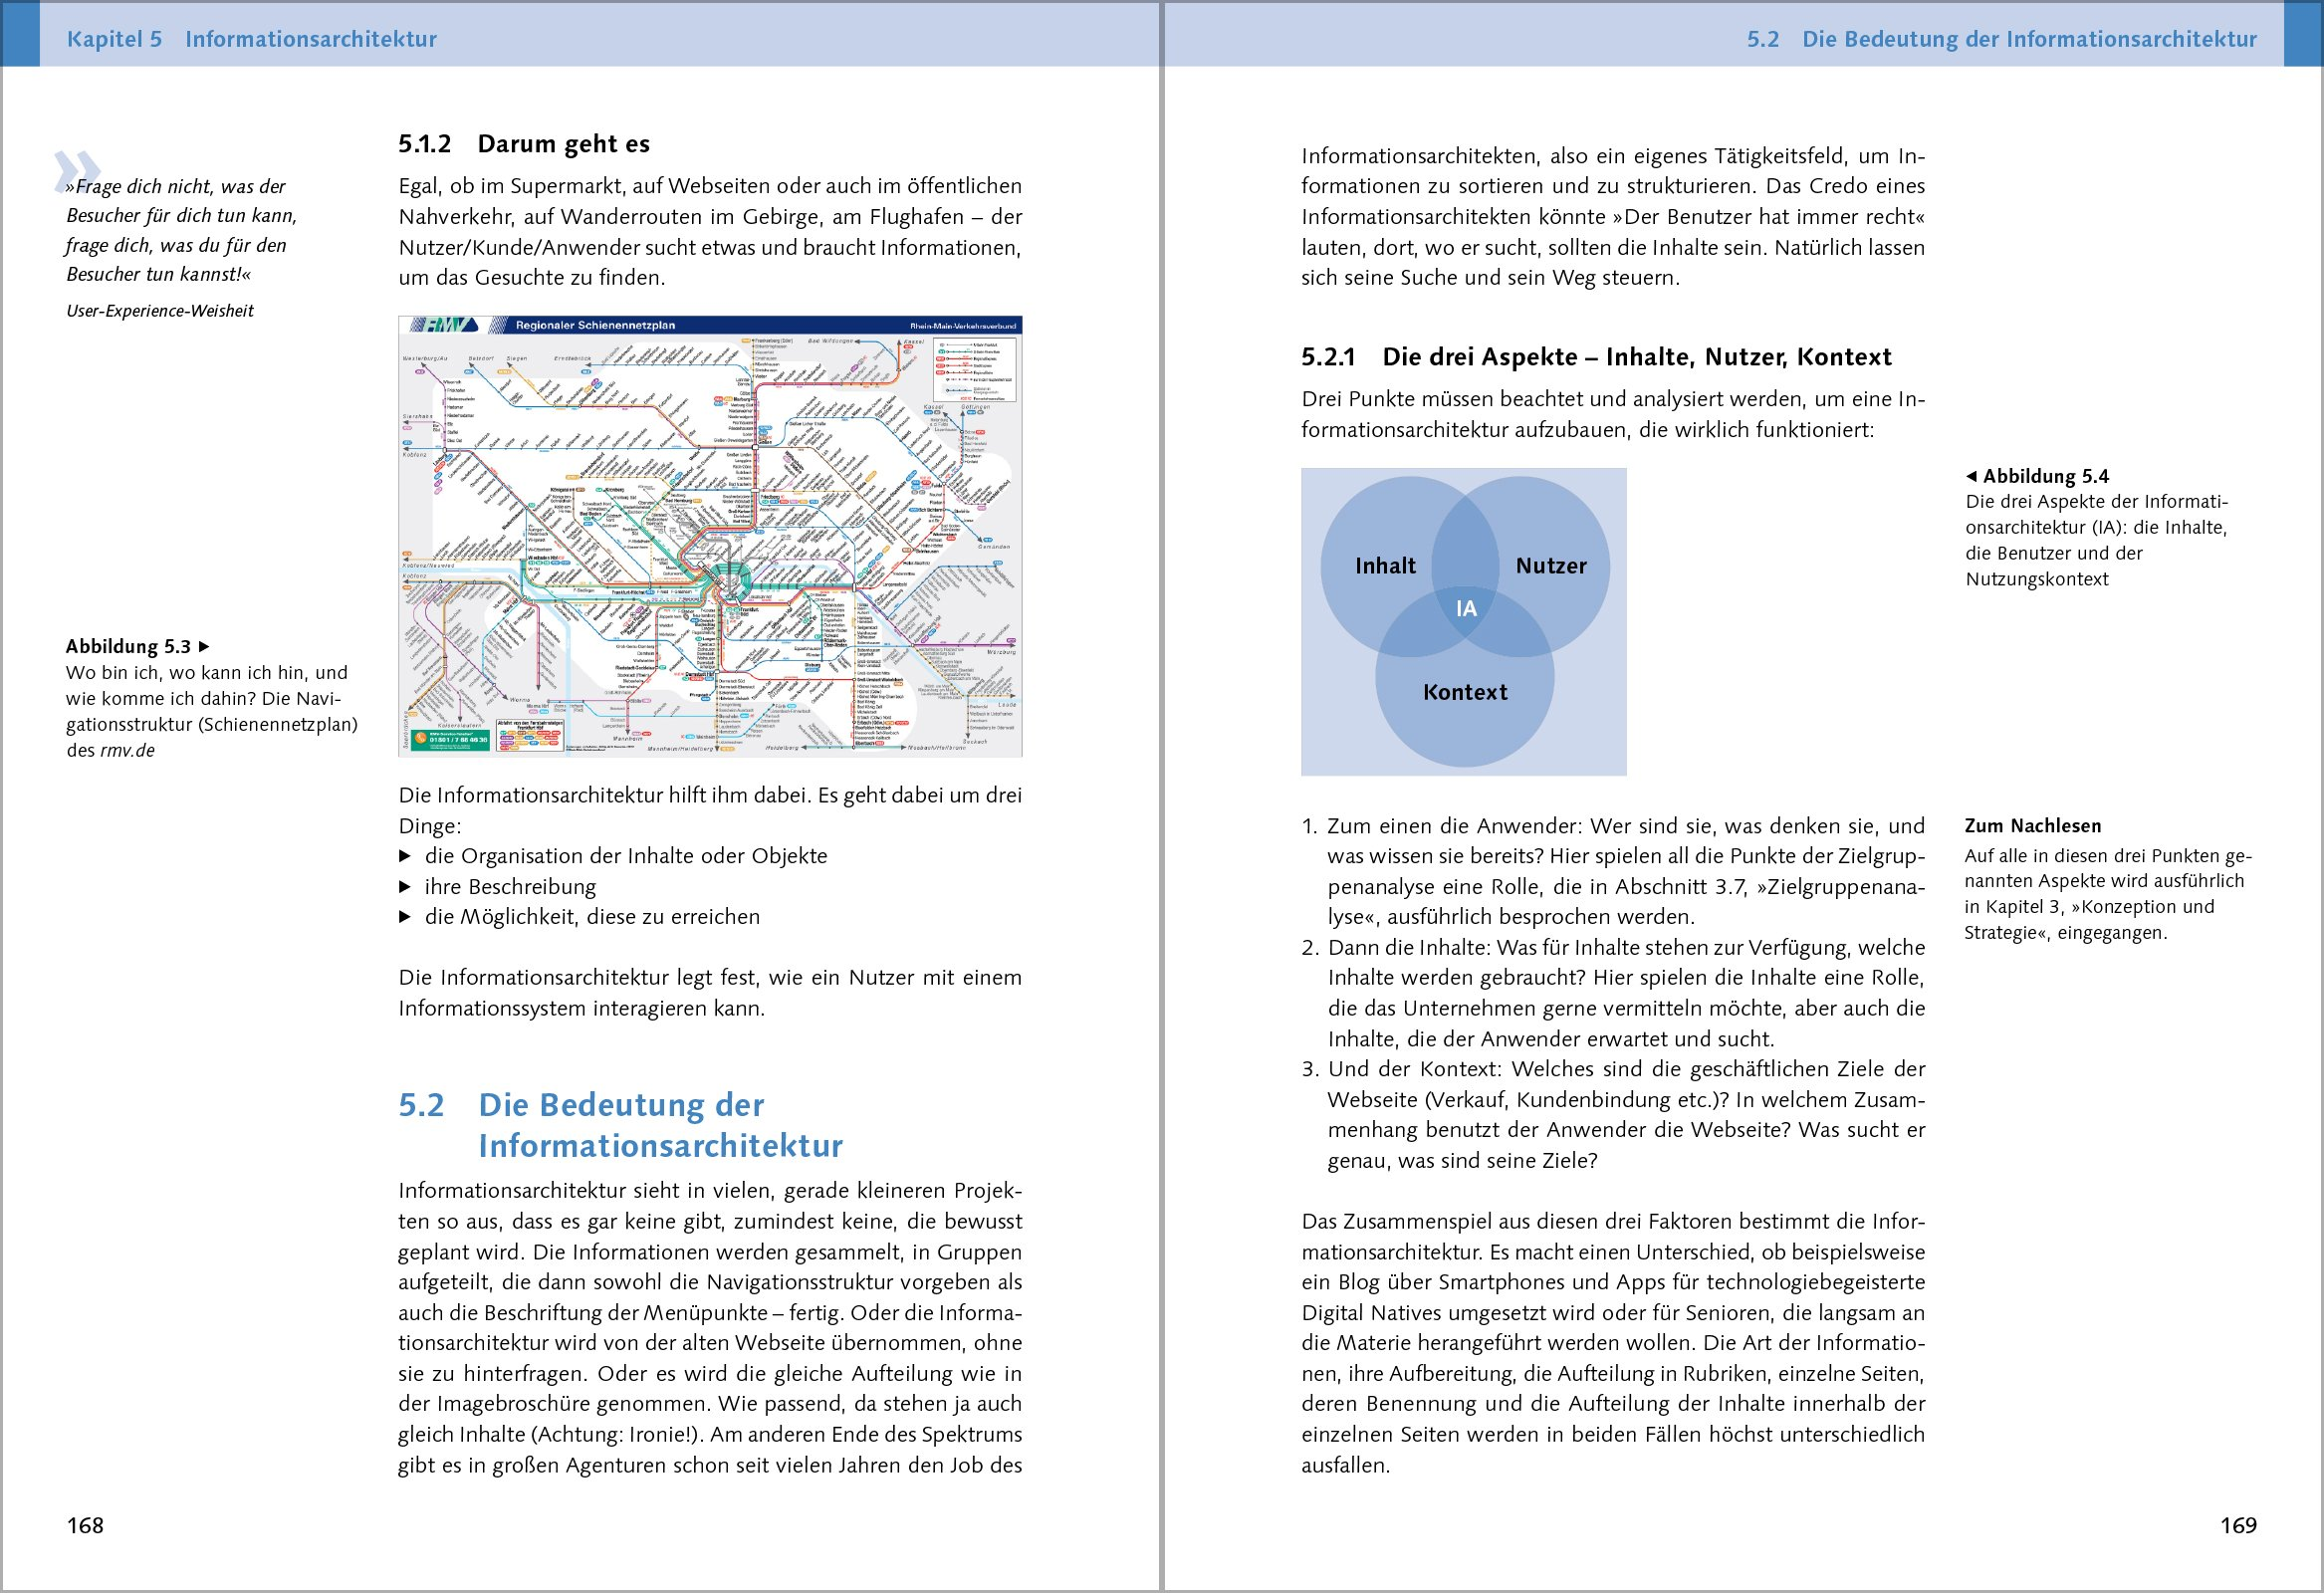 ebab7ff35f37 Webdesign: Das Handbuch zur Webgestaltung: Amazon.de: Martin Hahn ...